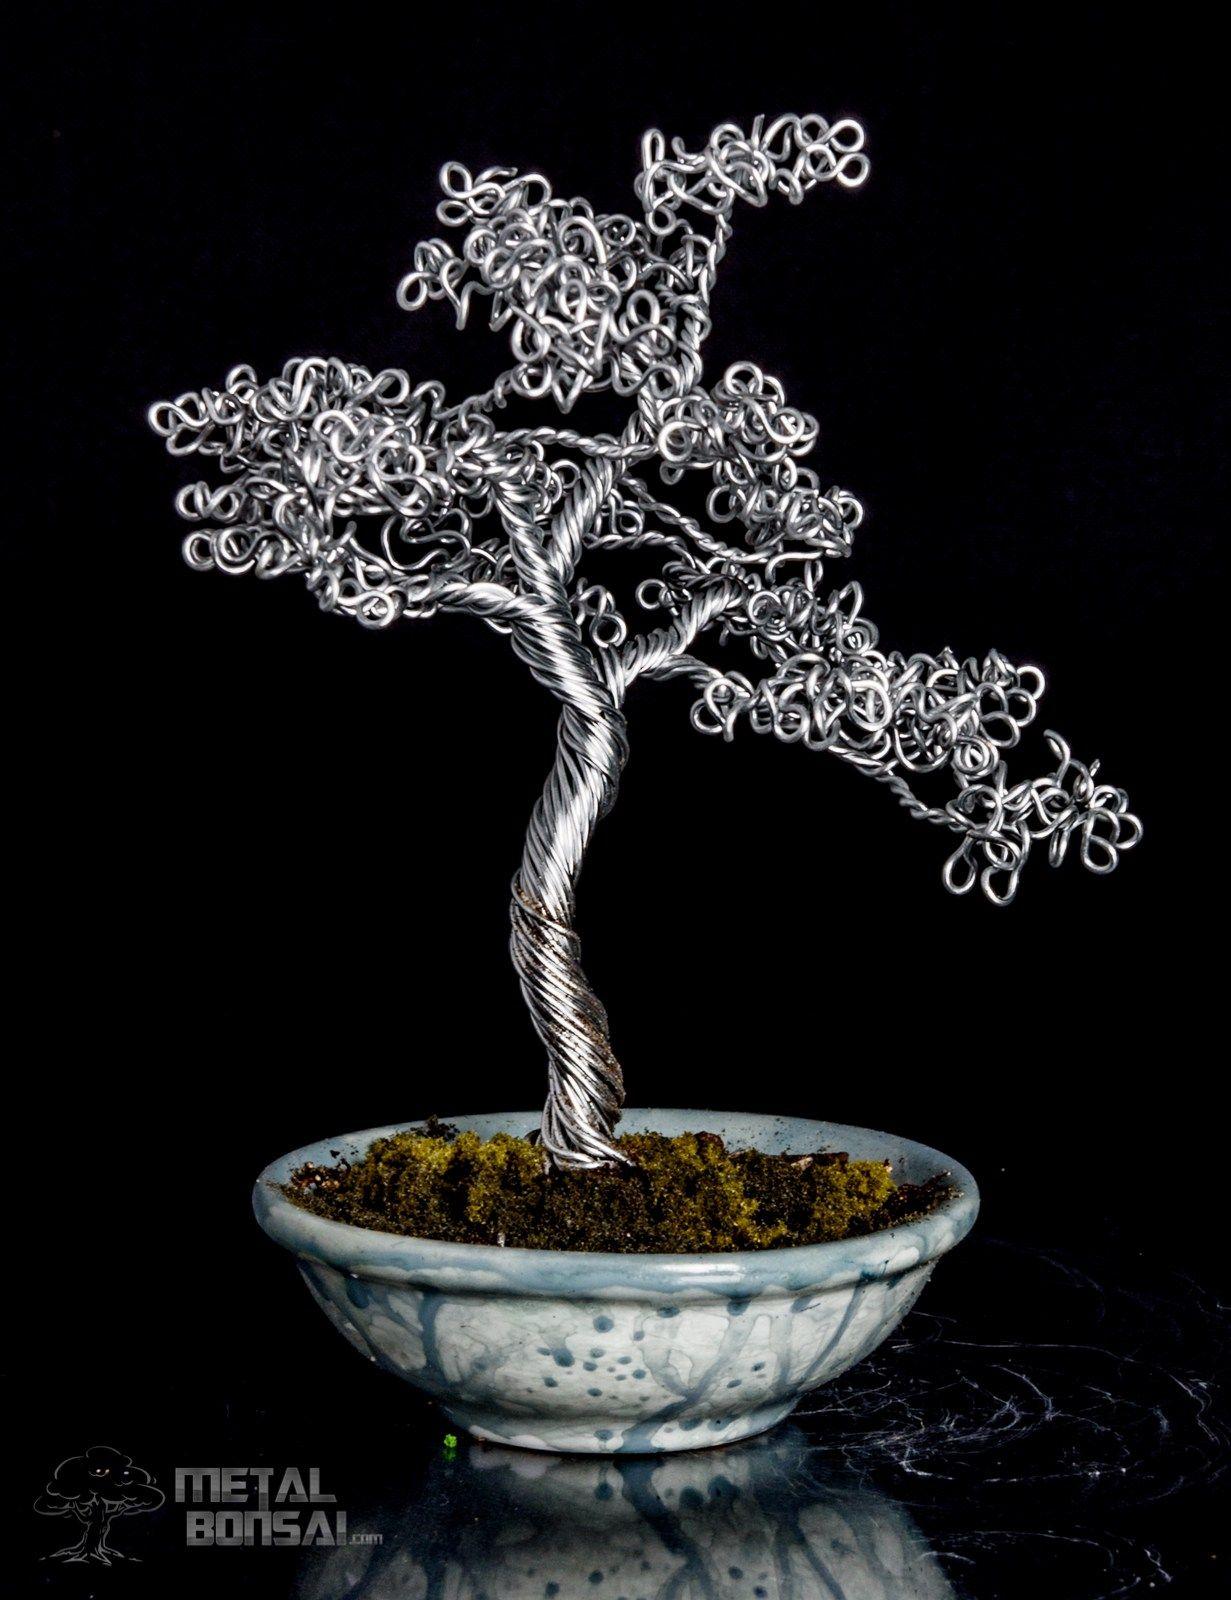 Metal Bonsai Tree : metal, bonsai, Natural, Sculpture,, Bonsai